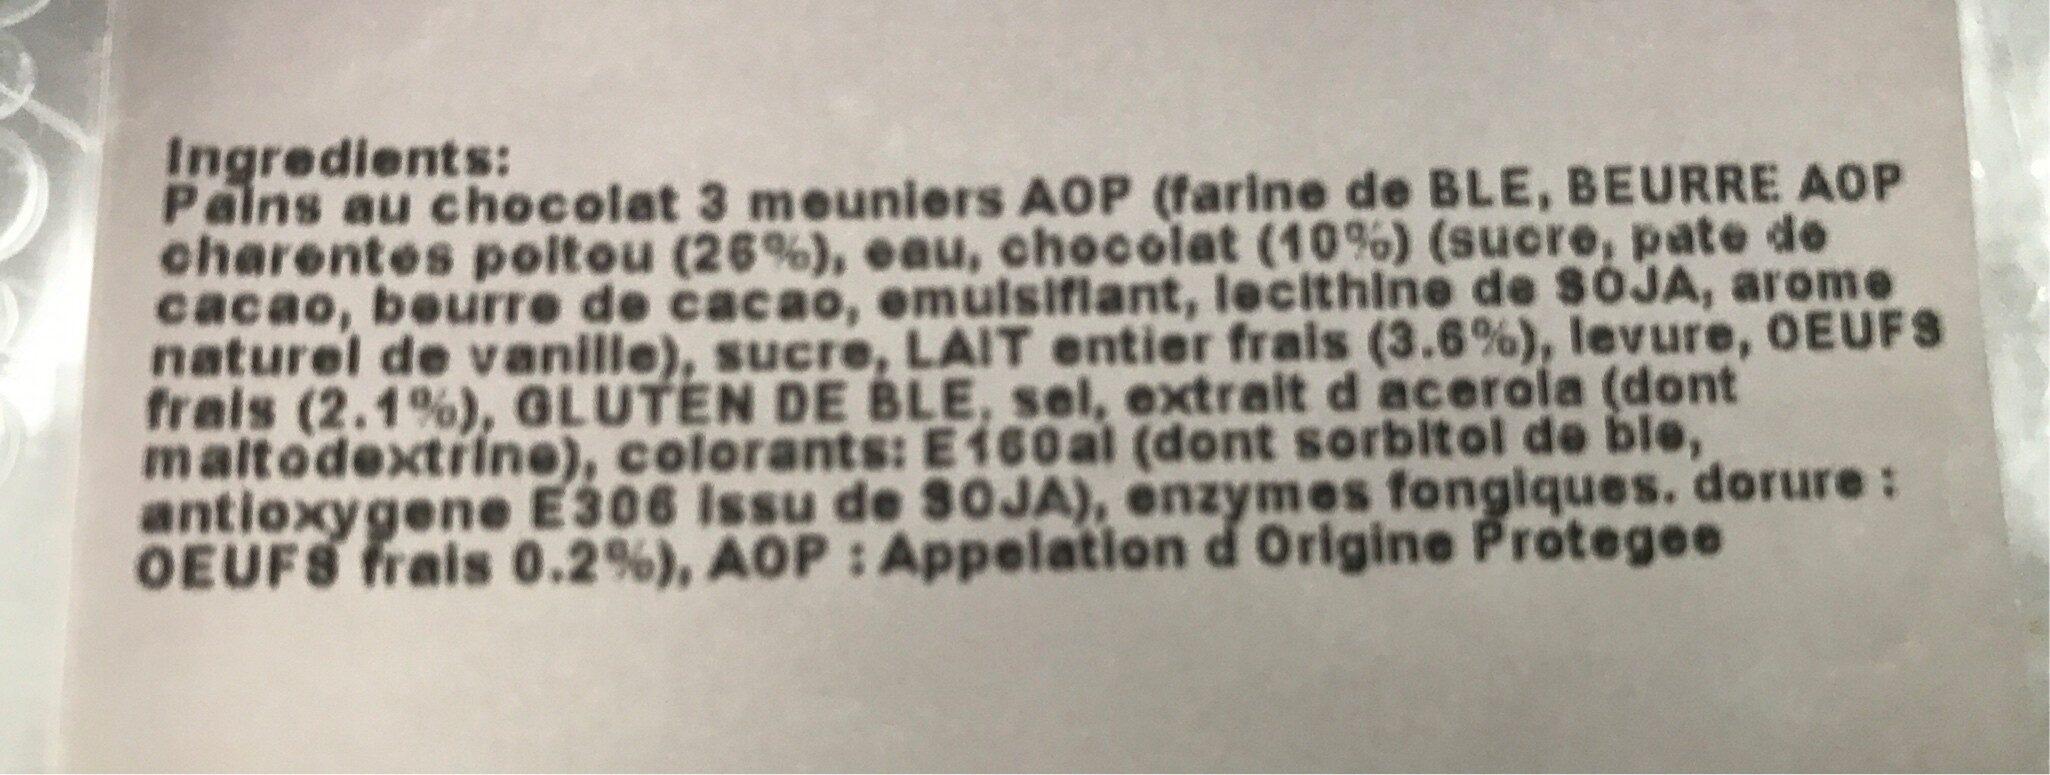 Pain au chocolat lecler - Ingredients - fr